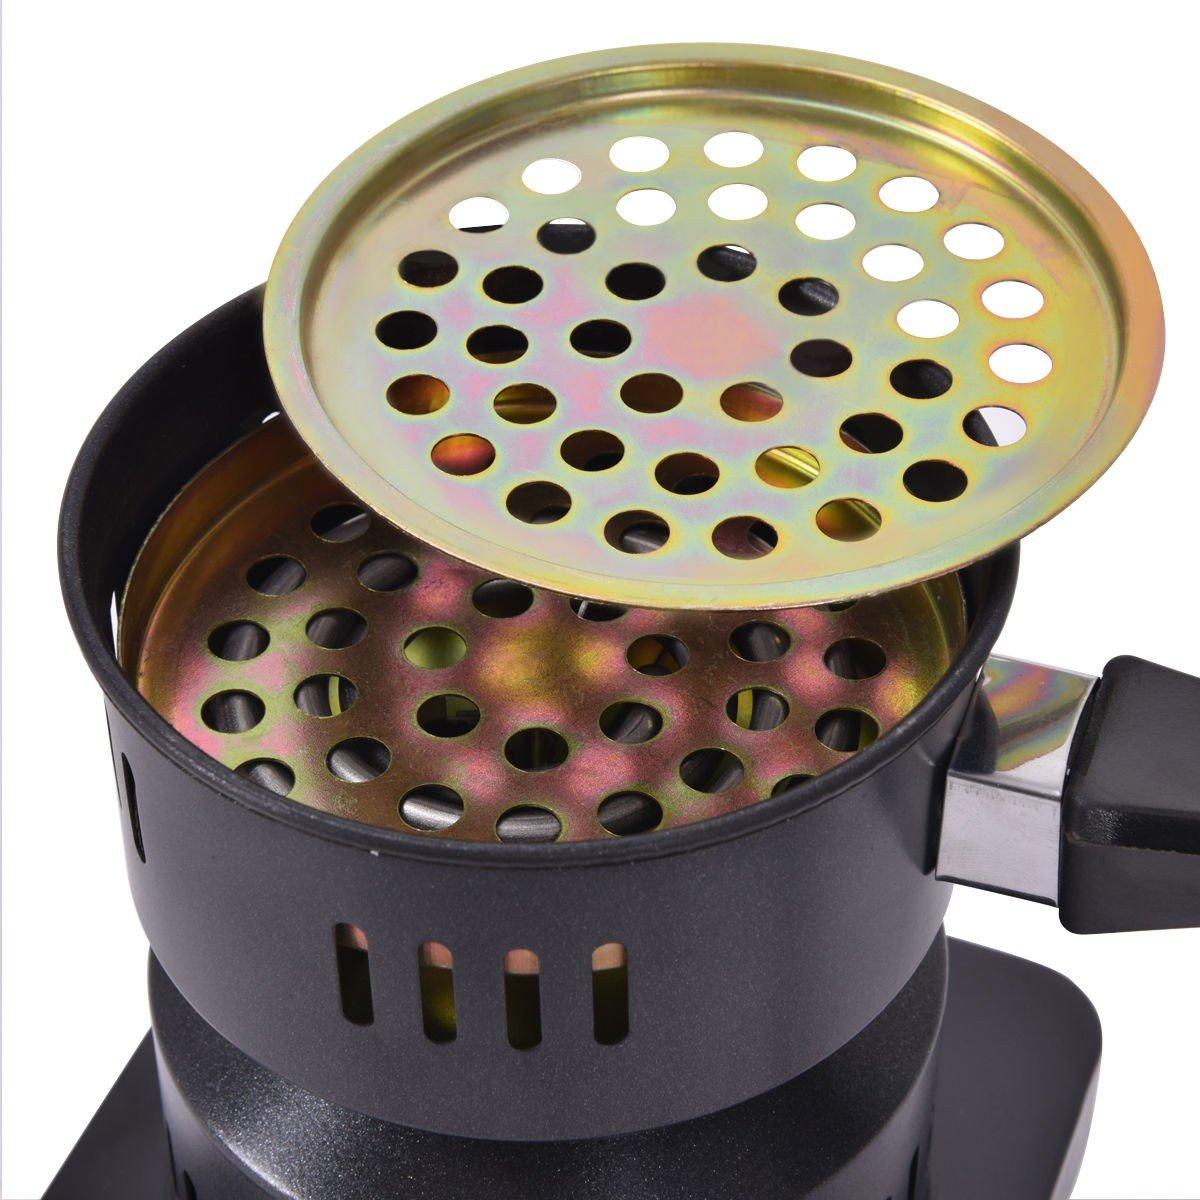 Amazon.com : Electric Charcoal Starter Hookah Shisha Nargila Heater Stove Charcoal Burner Costway : Garden & Outdoor